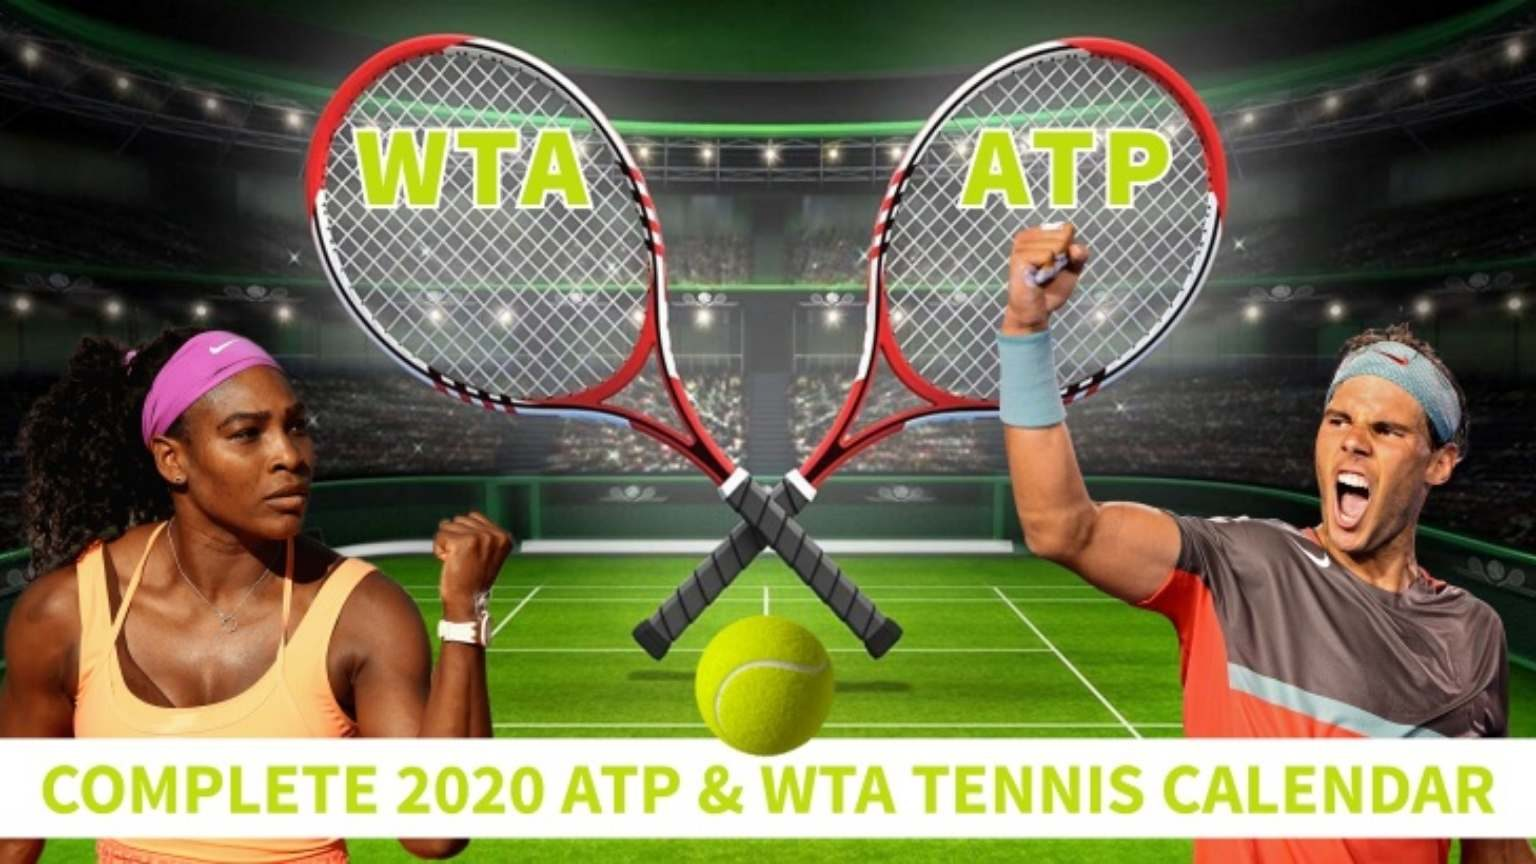 ATP WTA 2020 tennis Schedule announcement.